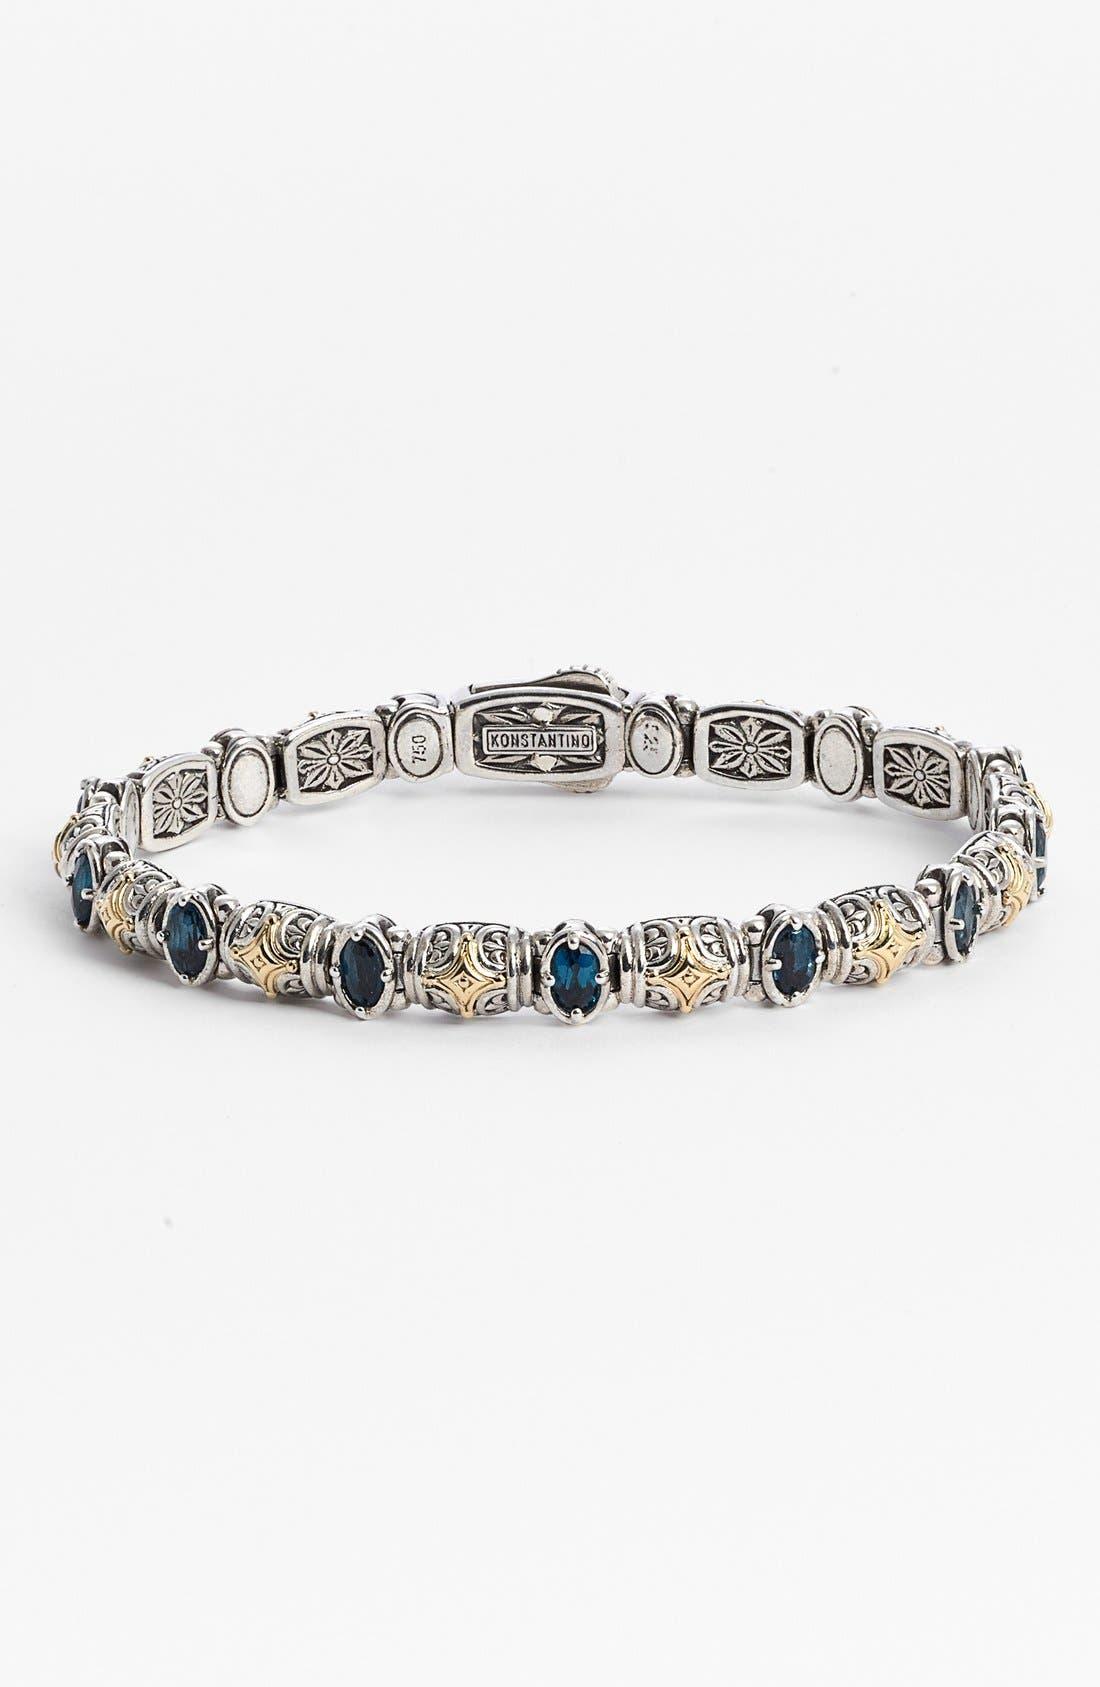 KONSTANTINO 'Hermione' Line Bracelet